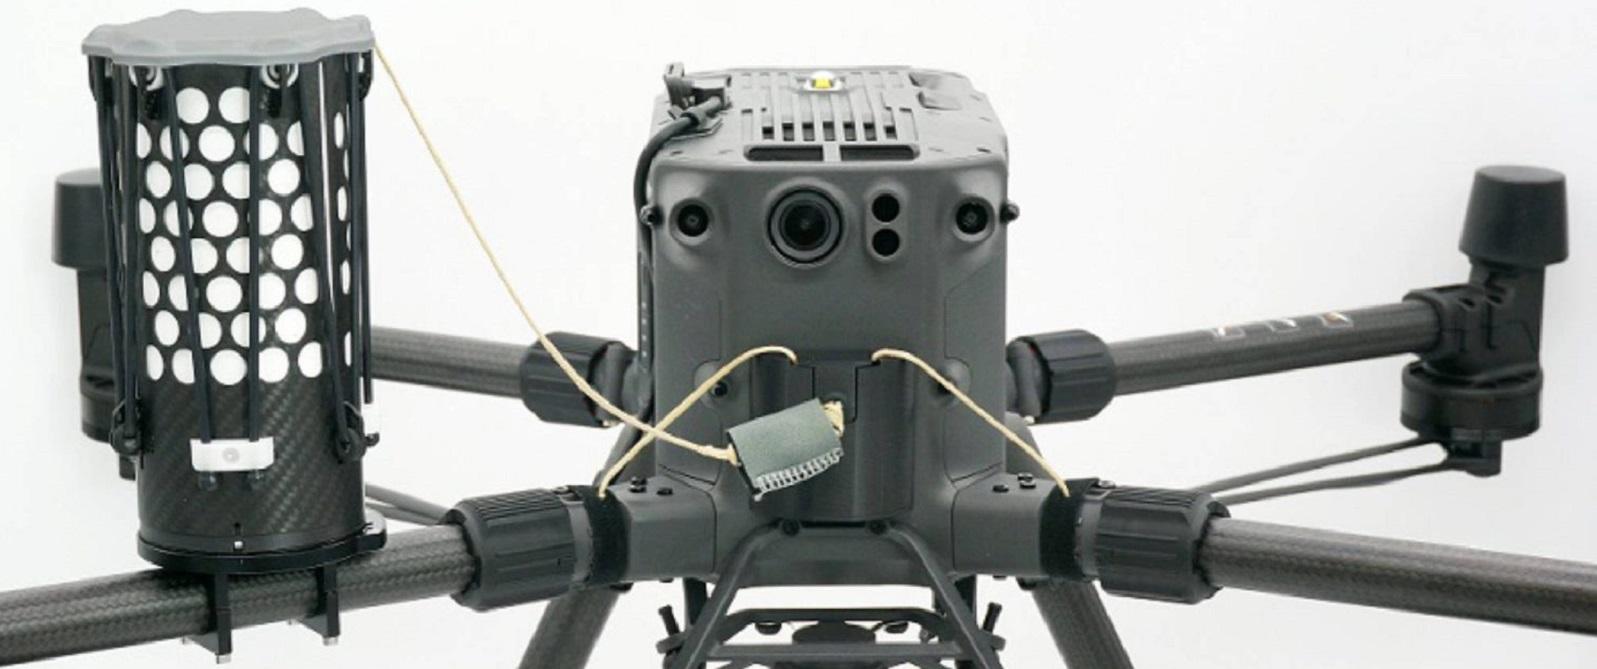 Drone Rescue запускает парашютную систему для DJI Matrice 300